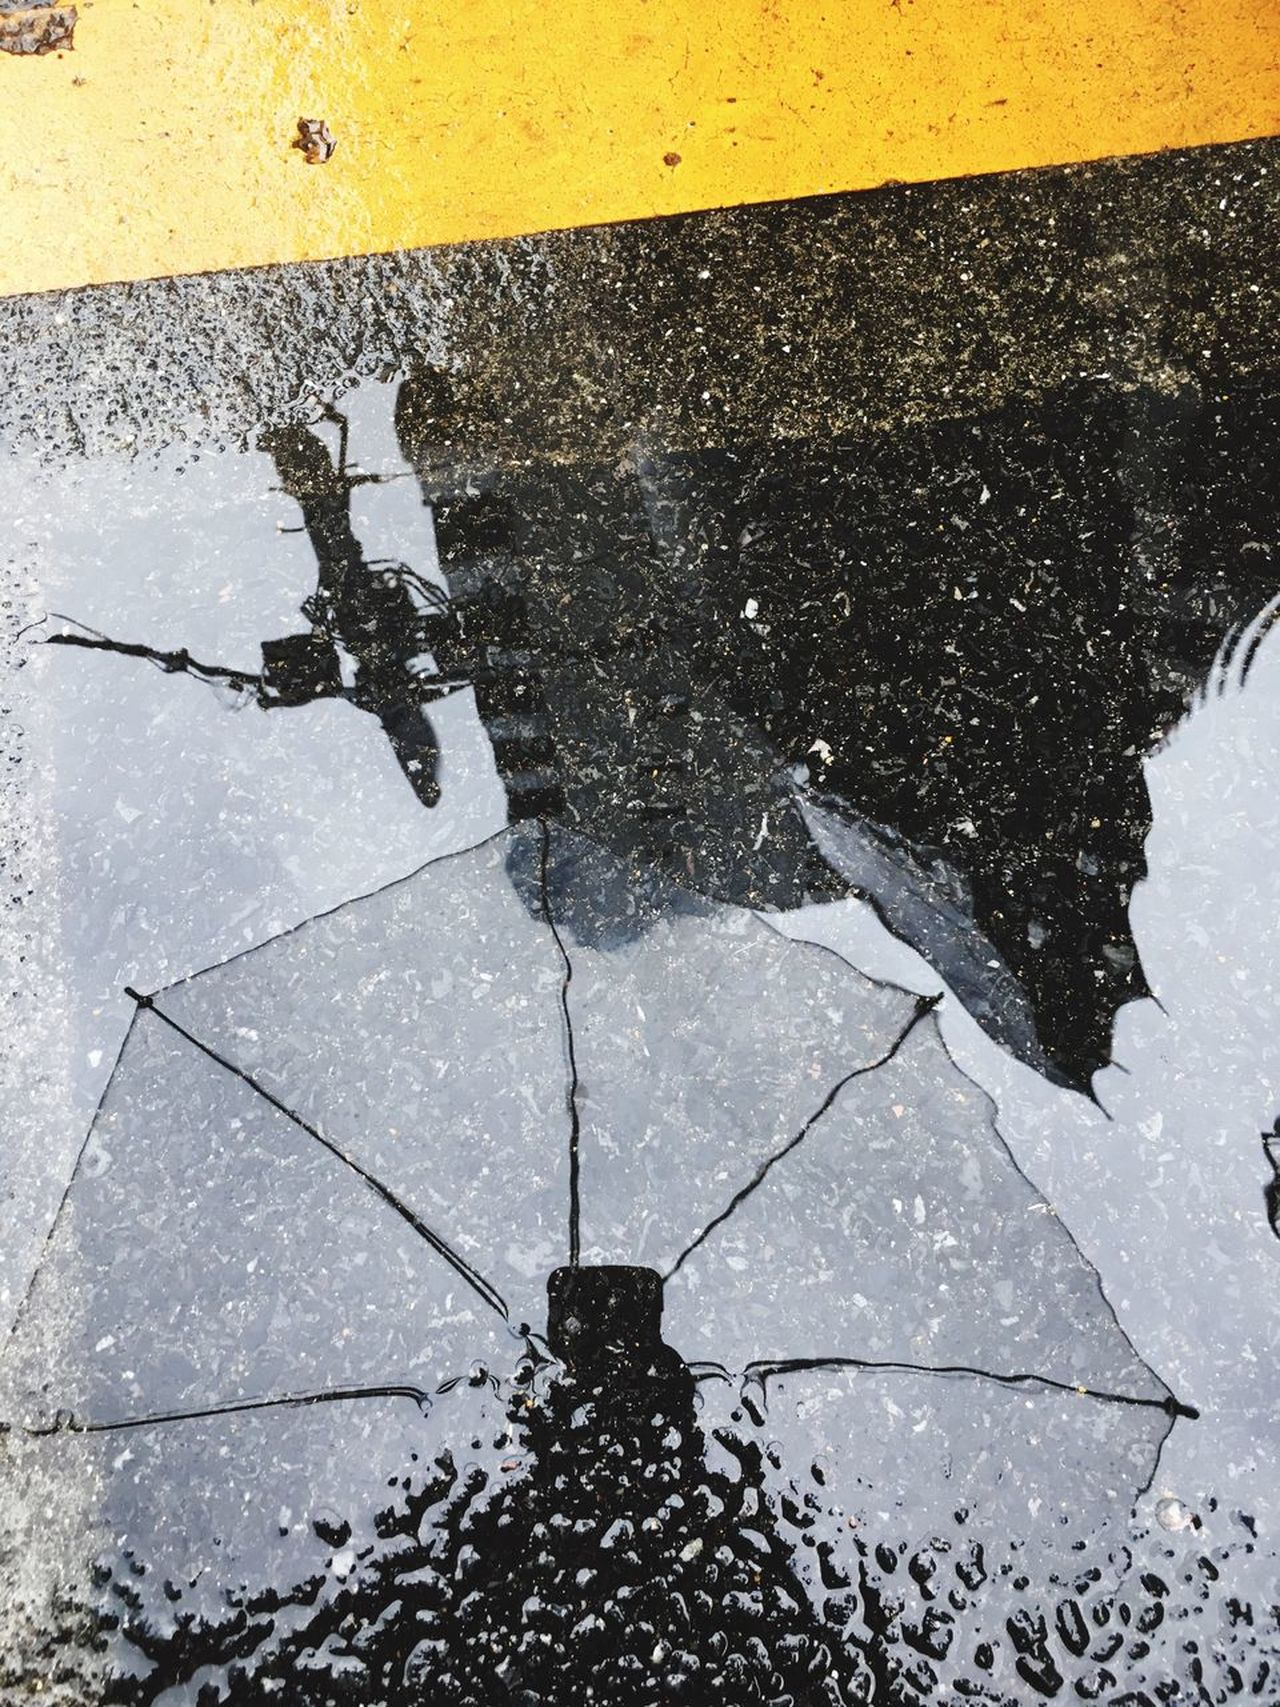 Reflection Puddle Wet Water Rain Umbrella Street